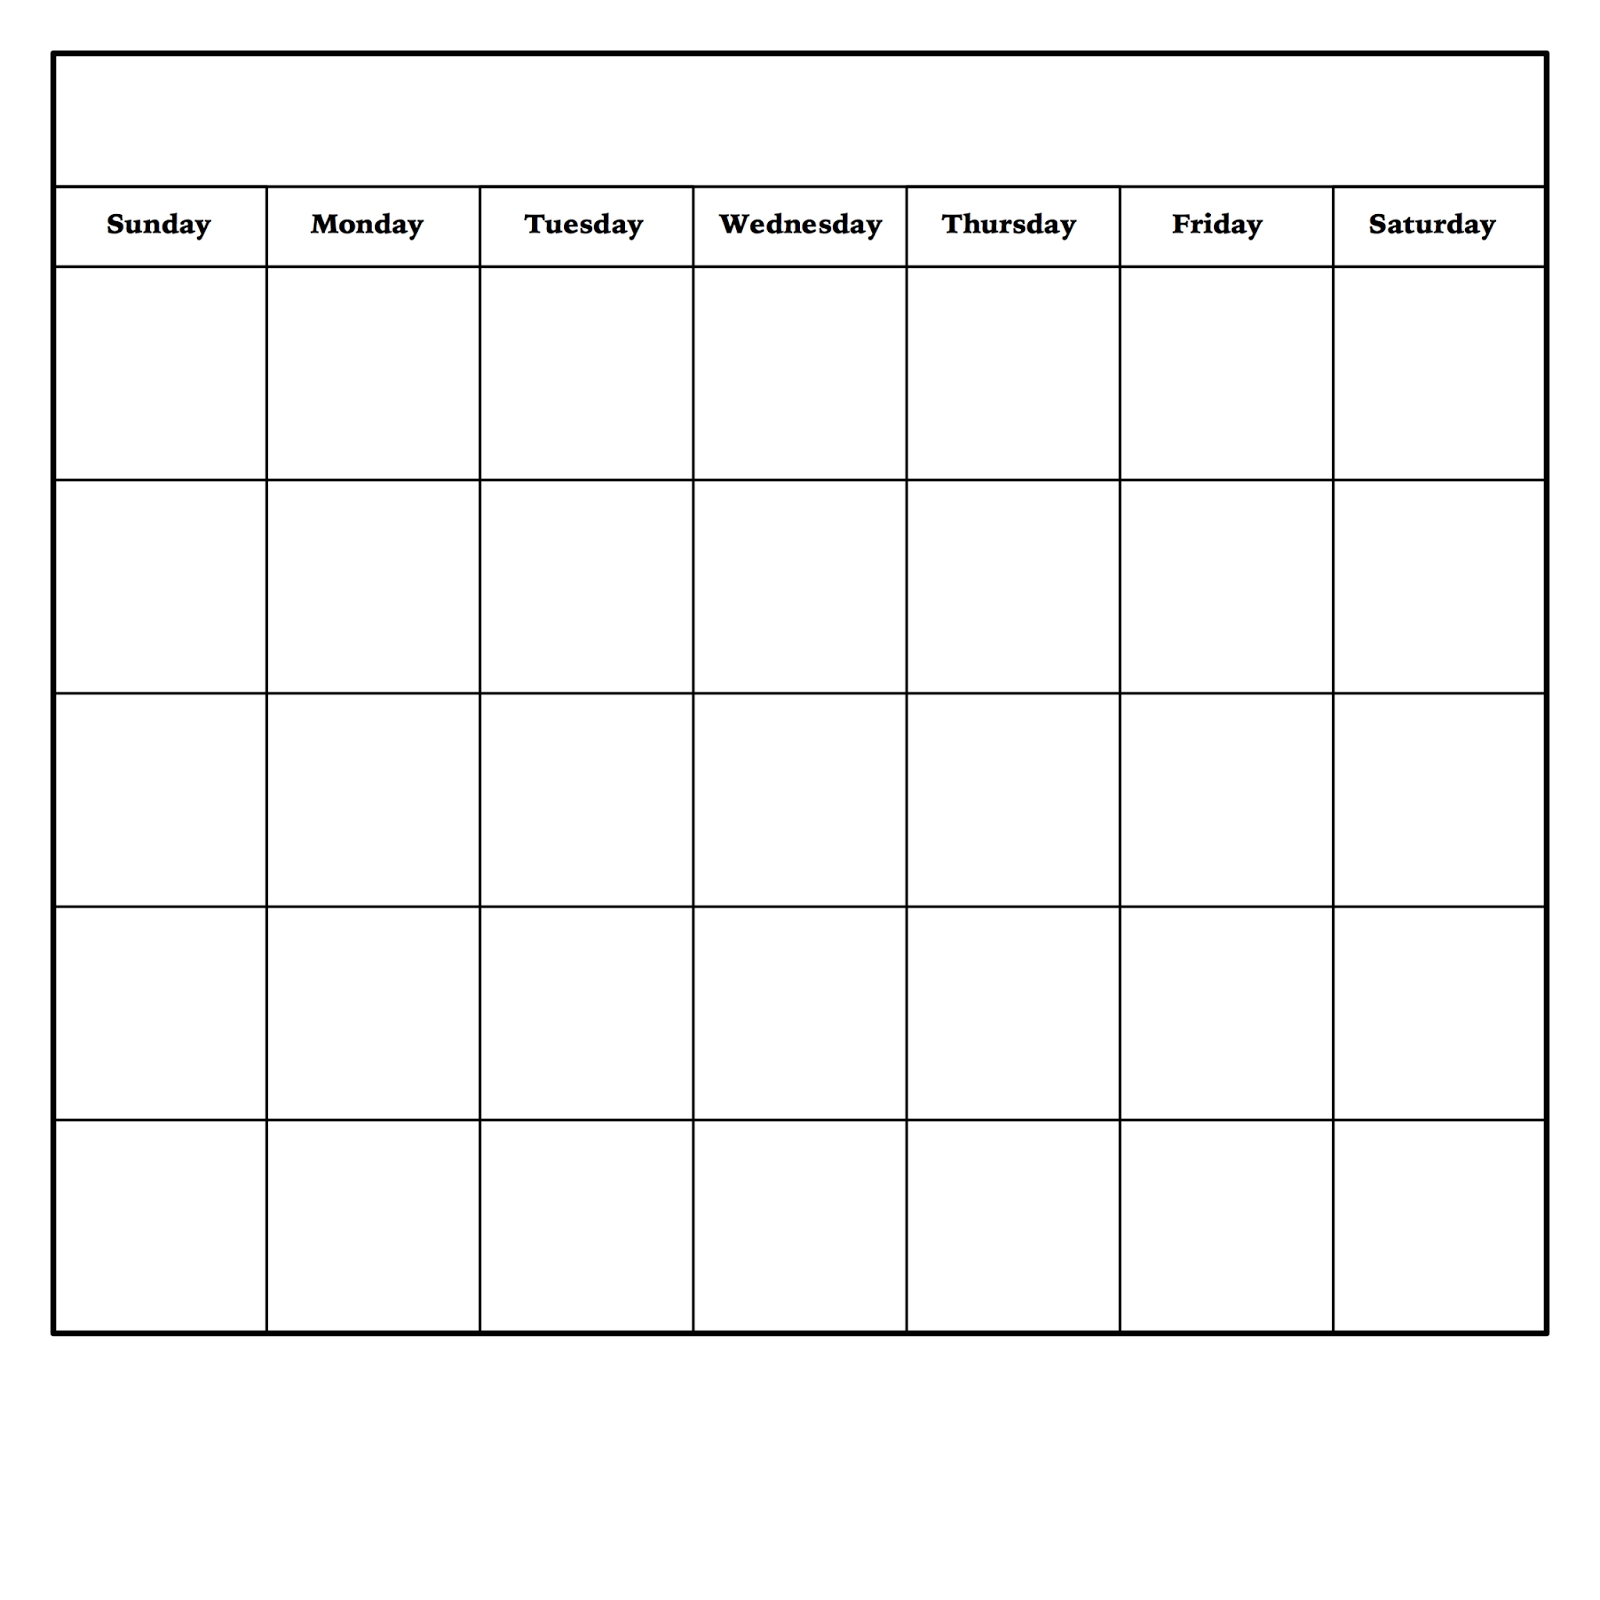 Diy Dry Erase Calendar | Share Today's Craft And Diy Ideas-Blank Month Calendar No Weekend